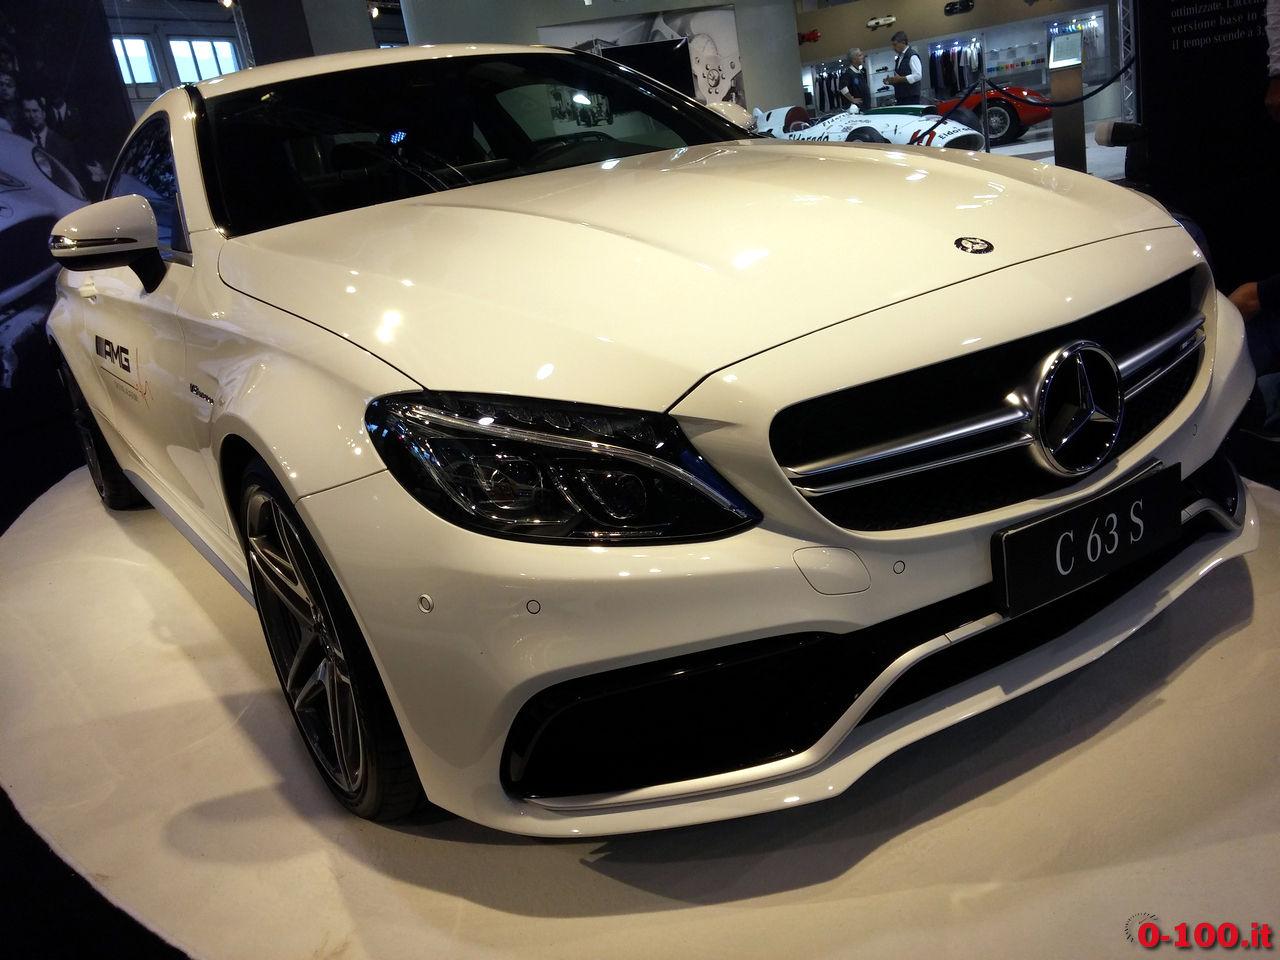 automotodepoca-2016-mercedes-car-market-mercato-auto-prezzo-price_0-10025